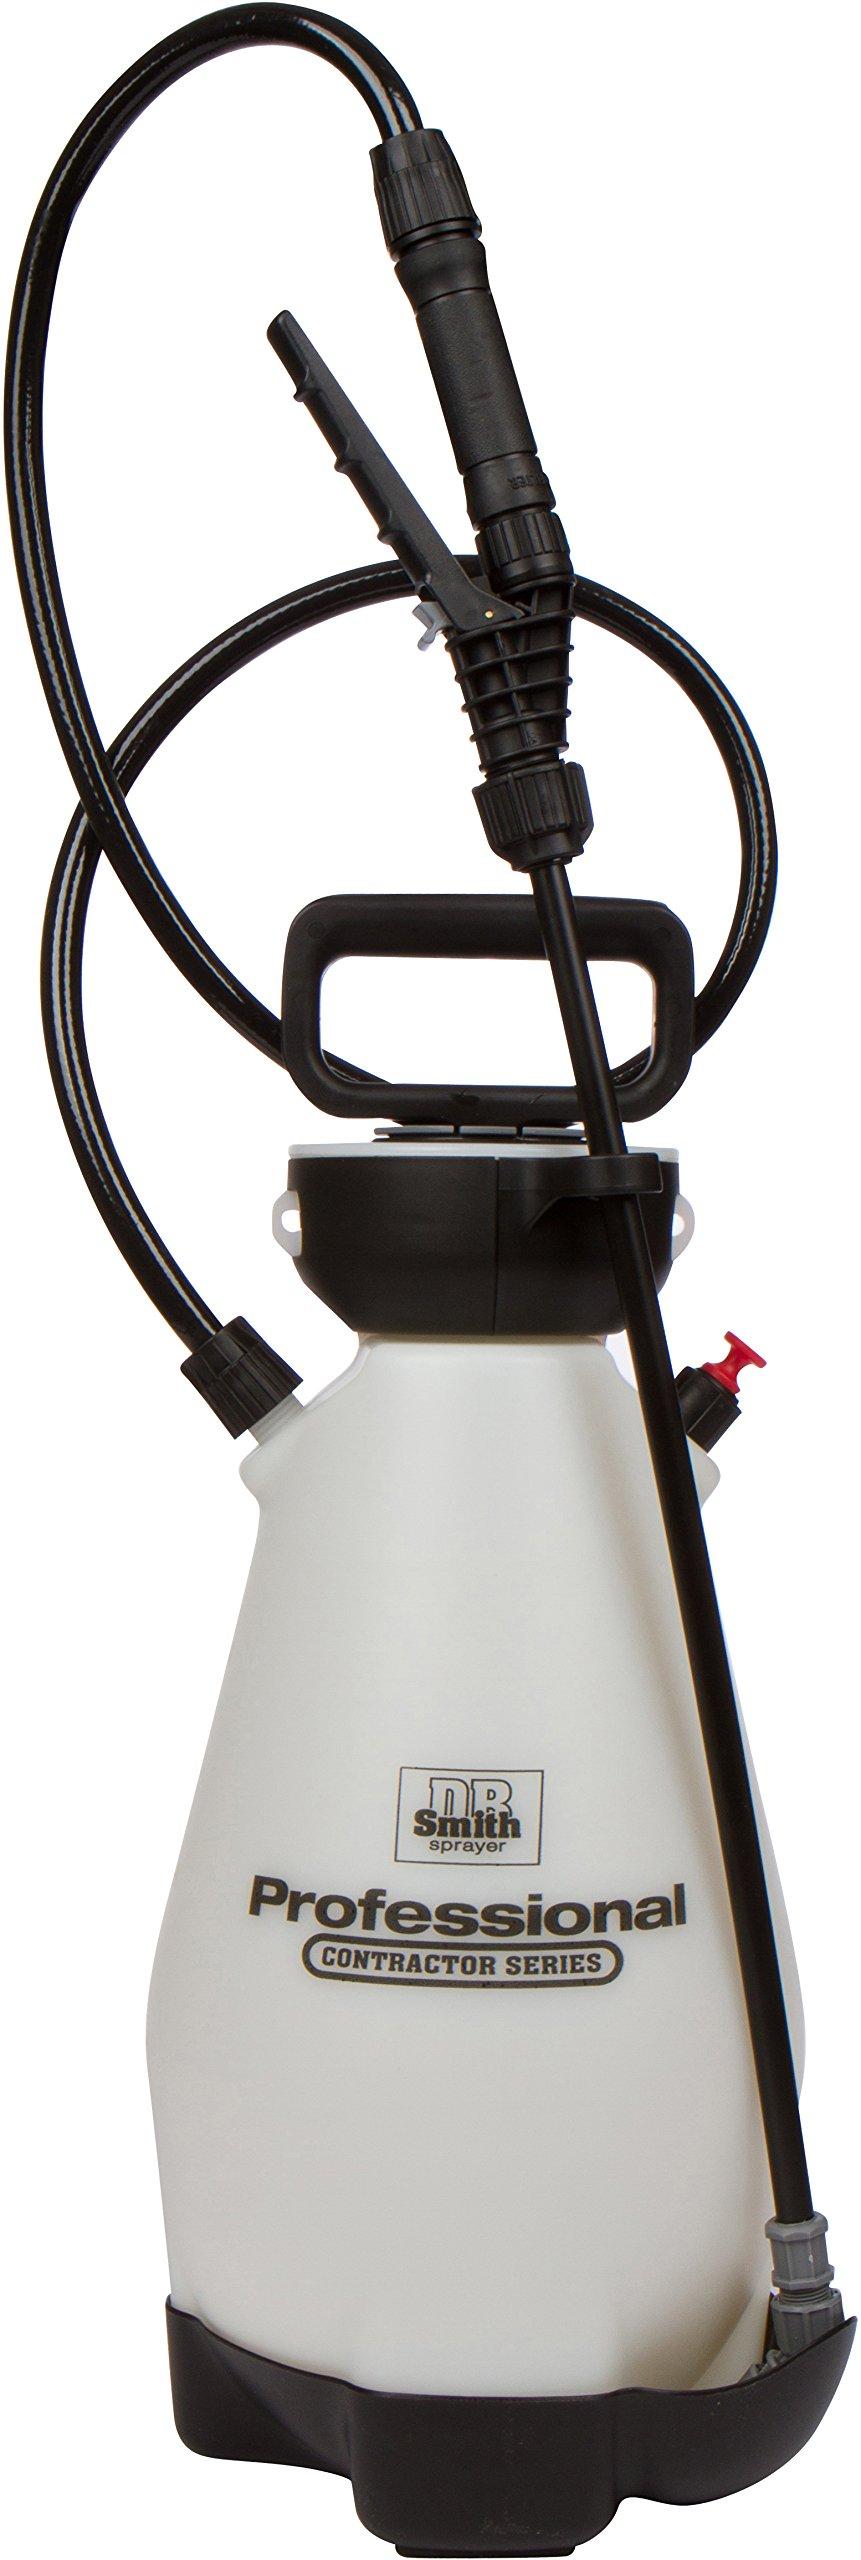 Smith 190361 Professional Compression Sprayer